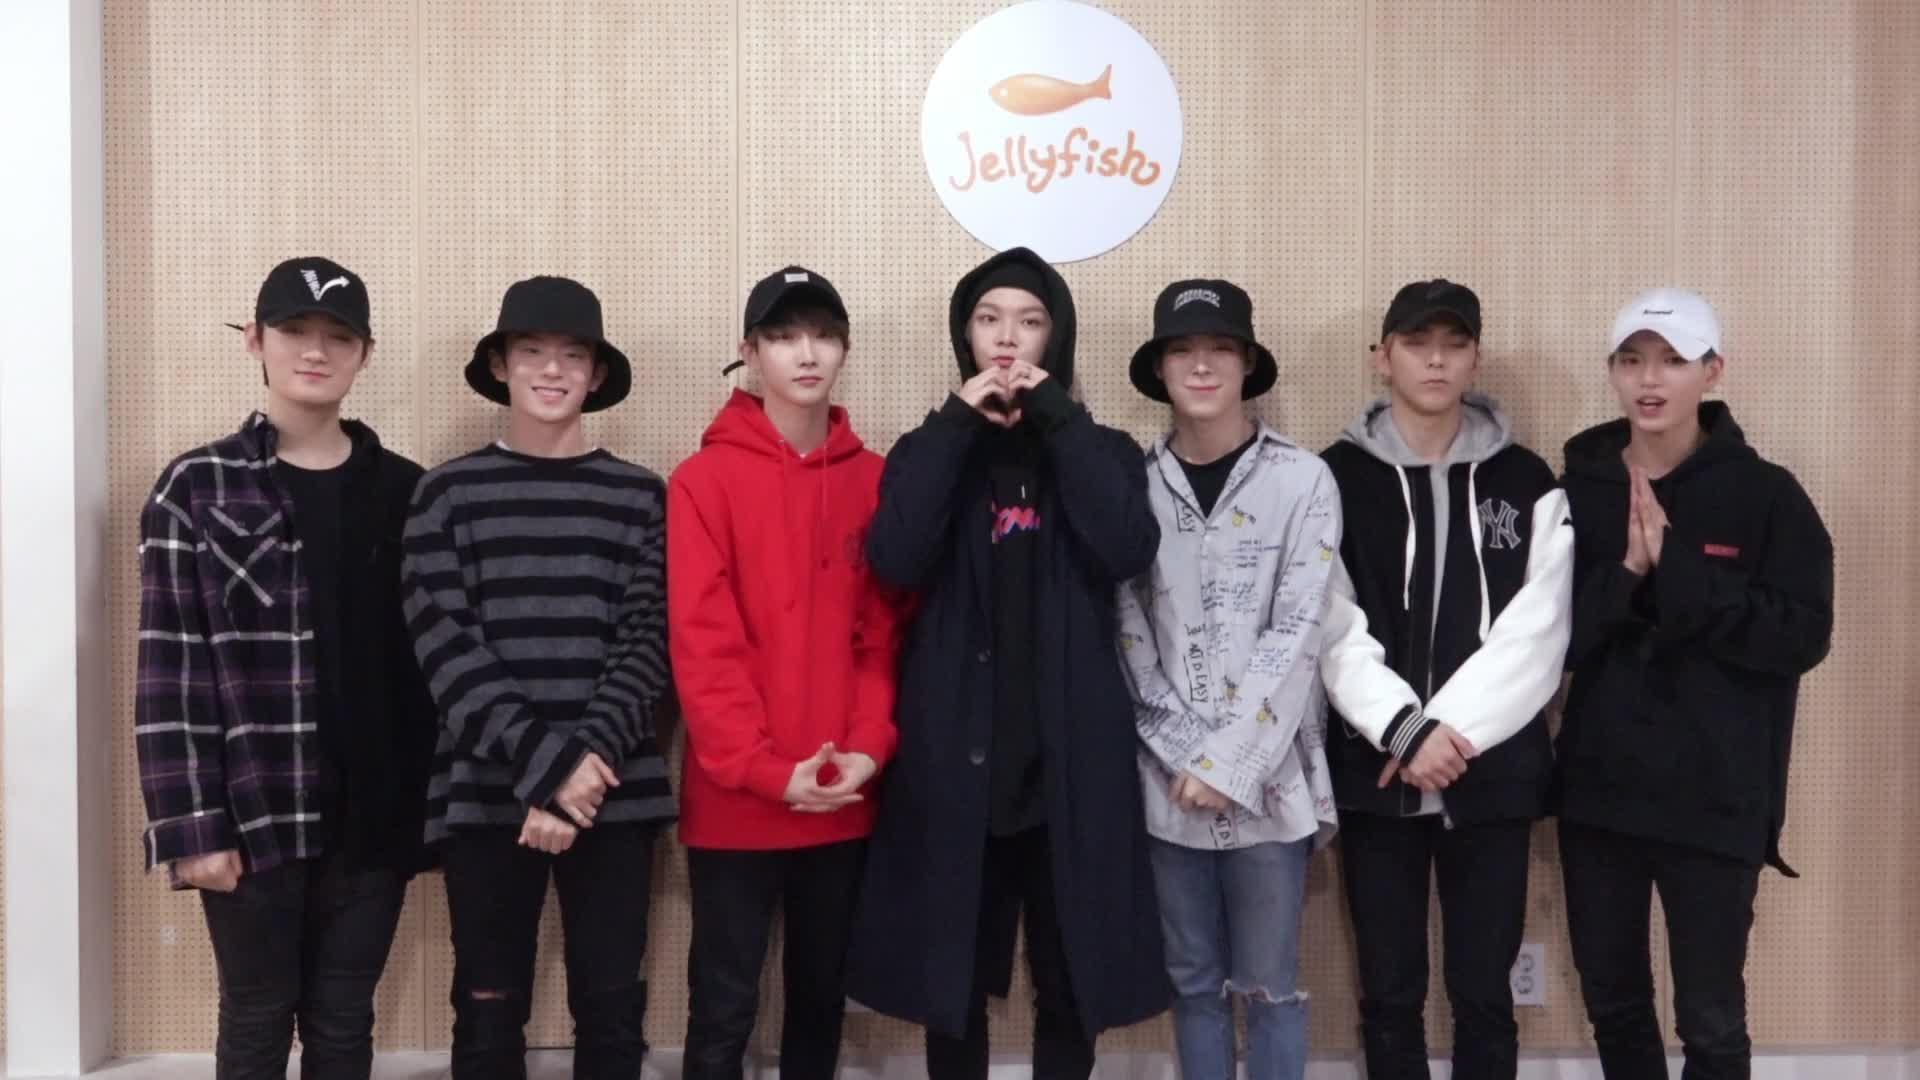 [♥ Mission] VERIVERY 's 1000만 하트 미션💓